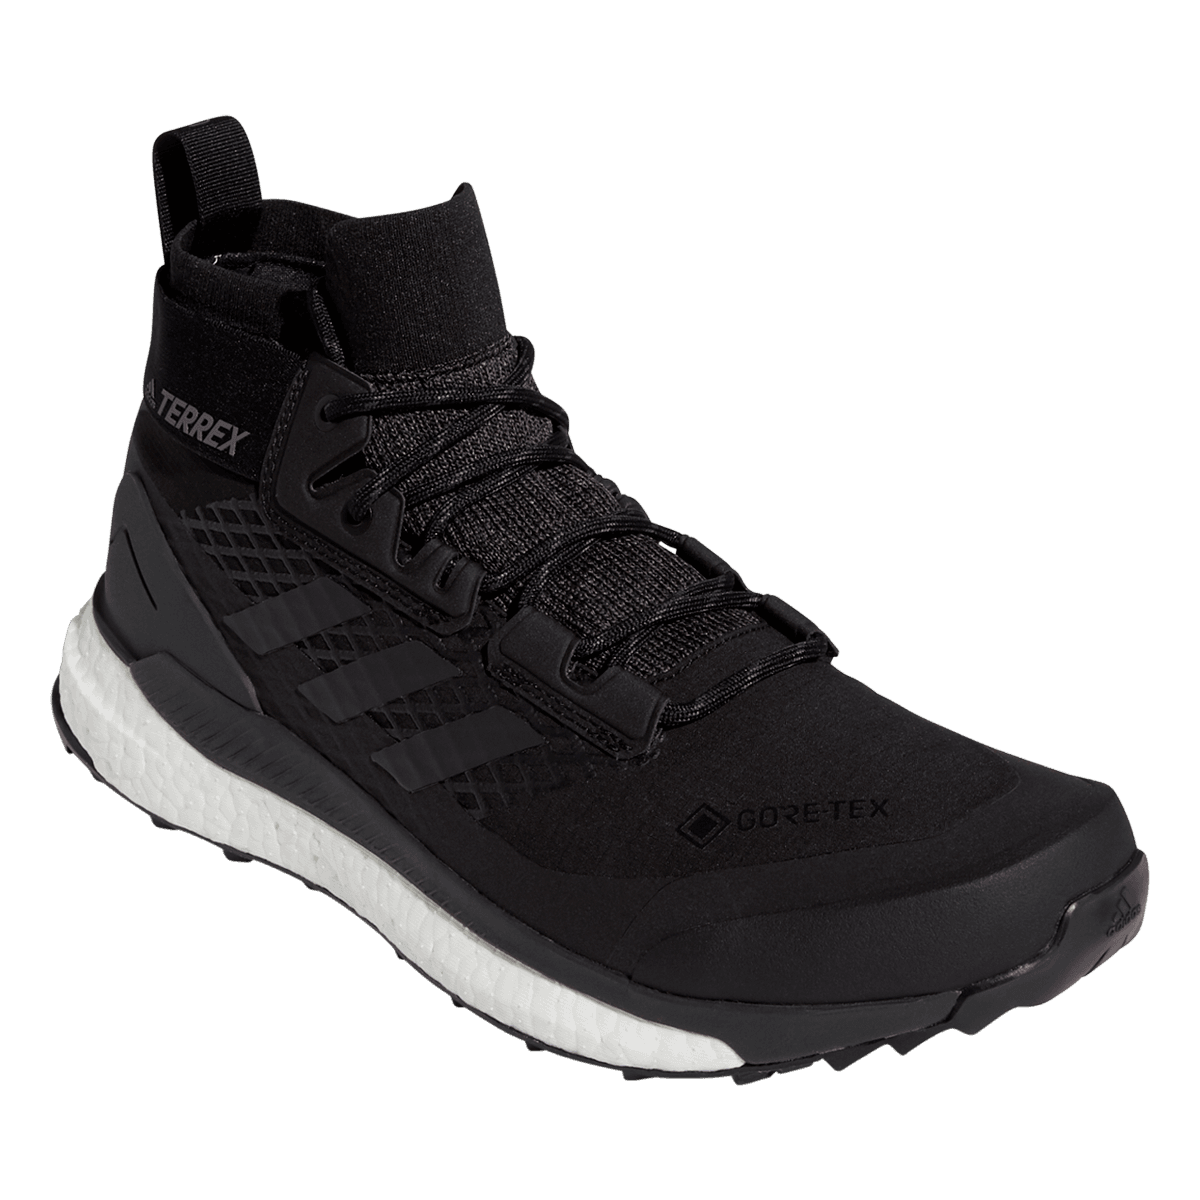 adidas Terrex Free Hiker GTX cipő feketefehér